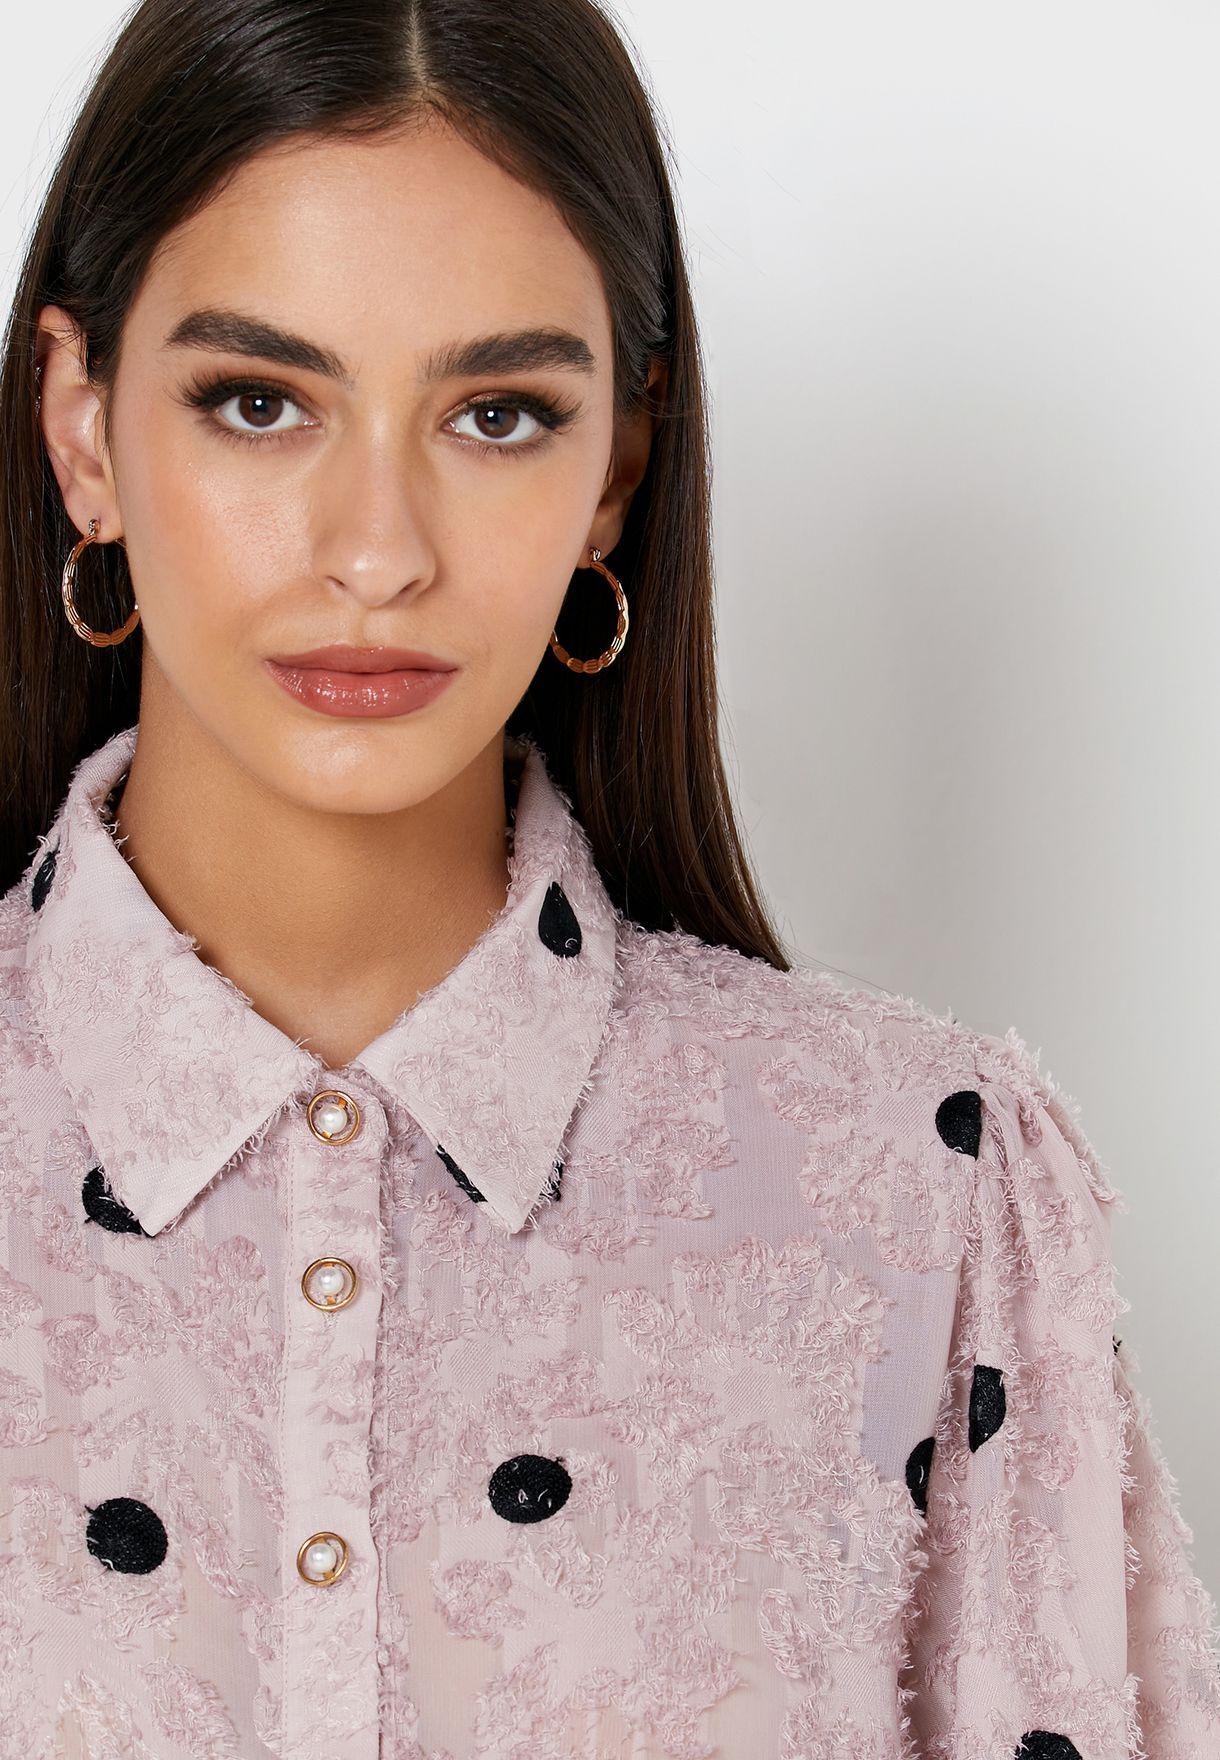 قميص مزين بطبعات نقاط